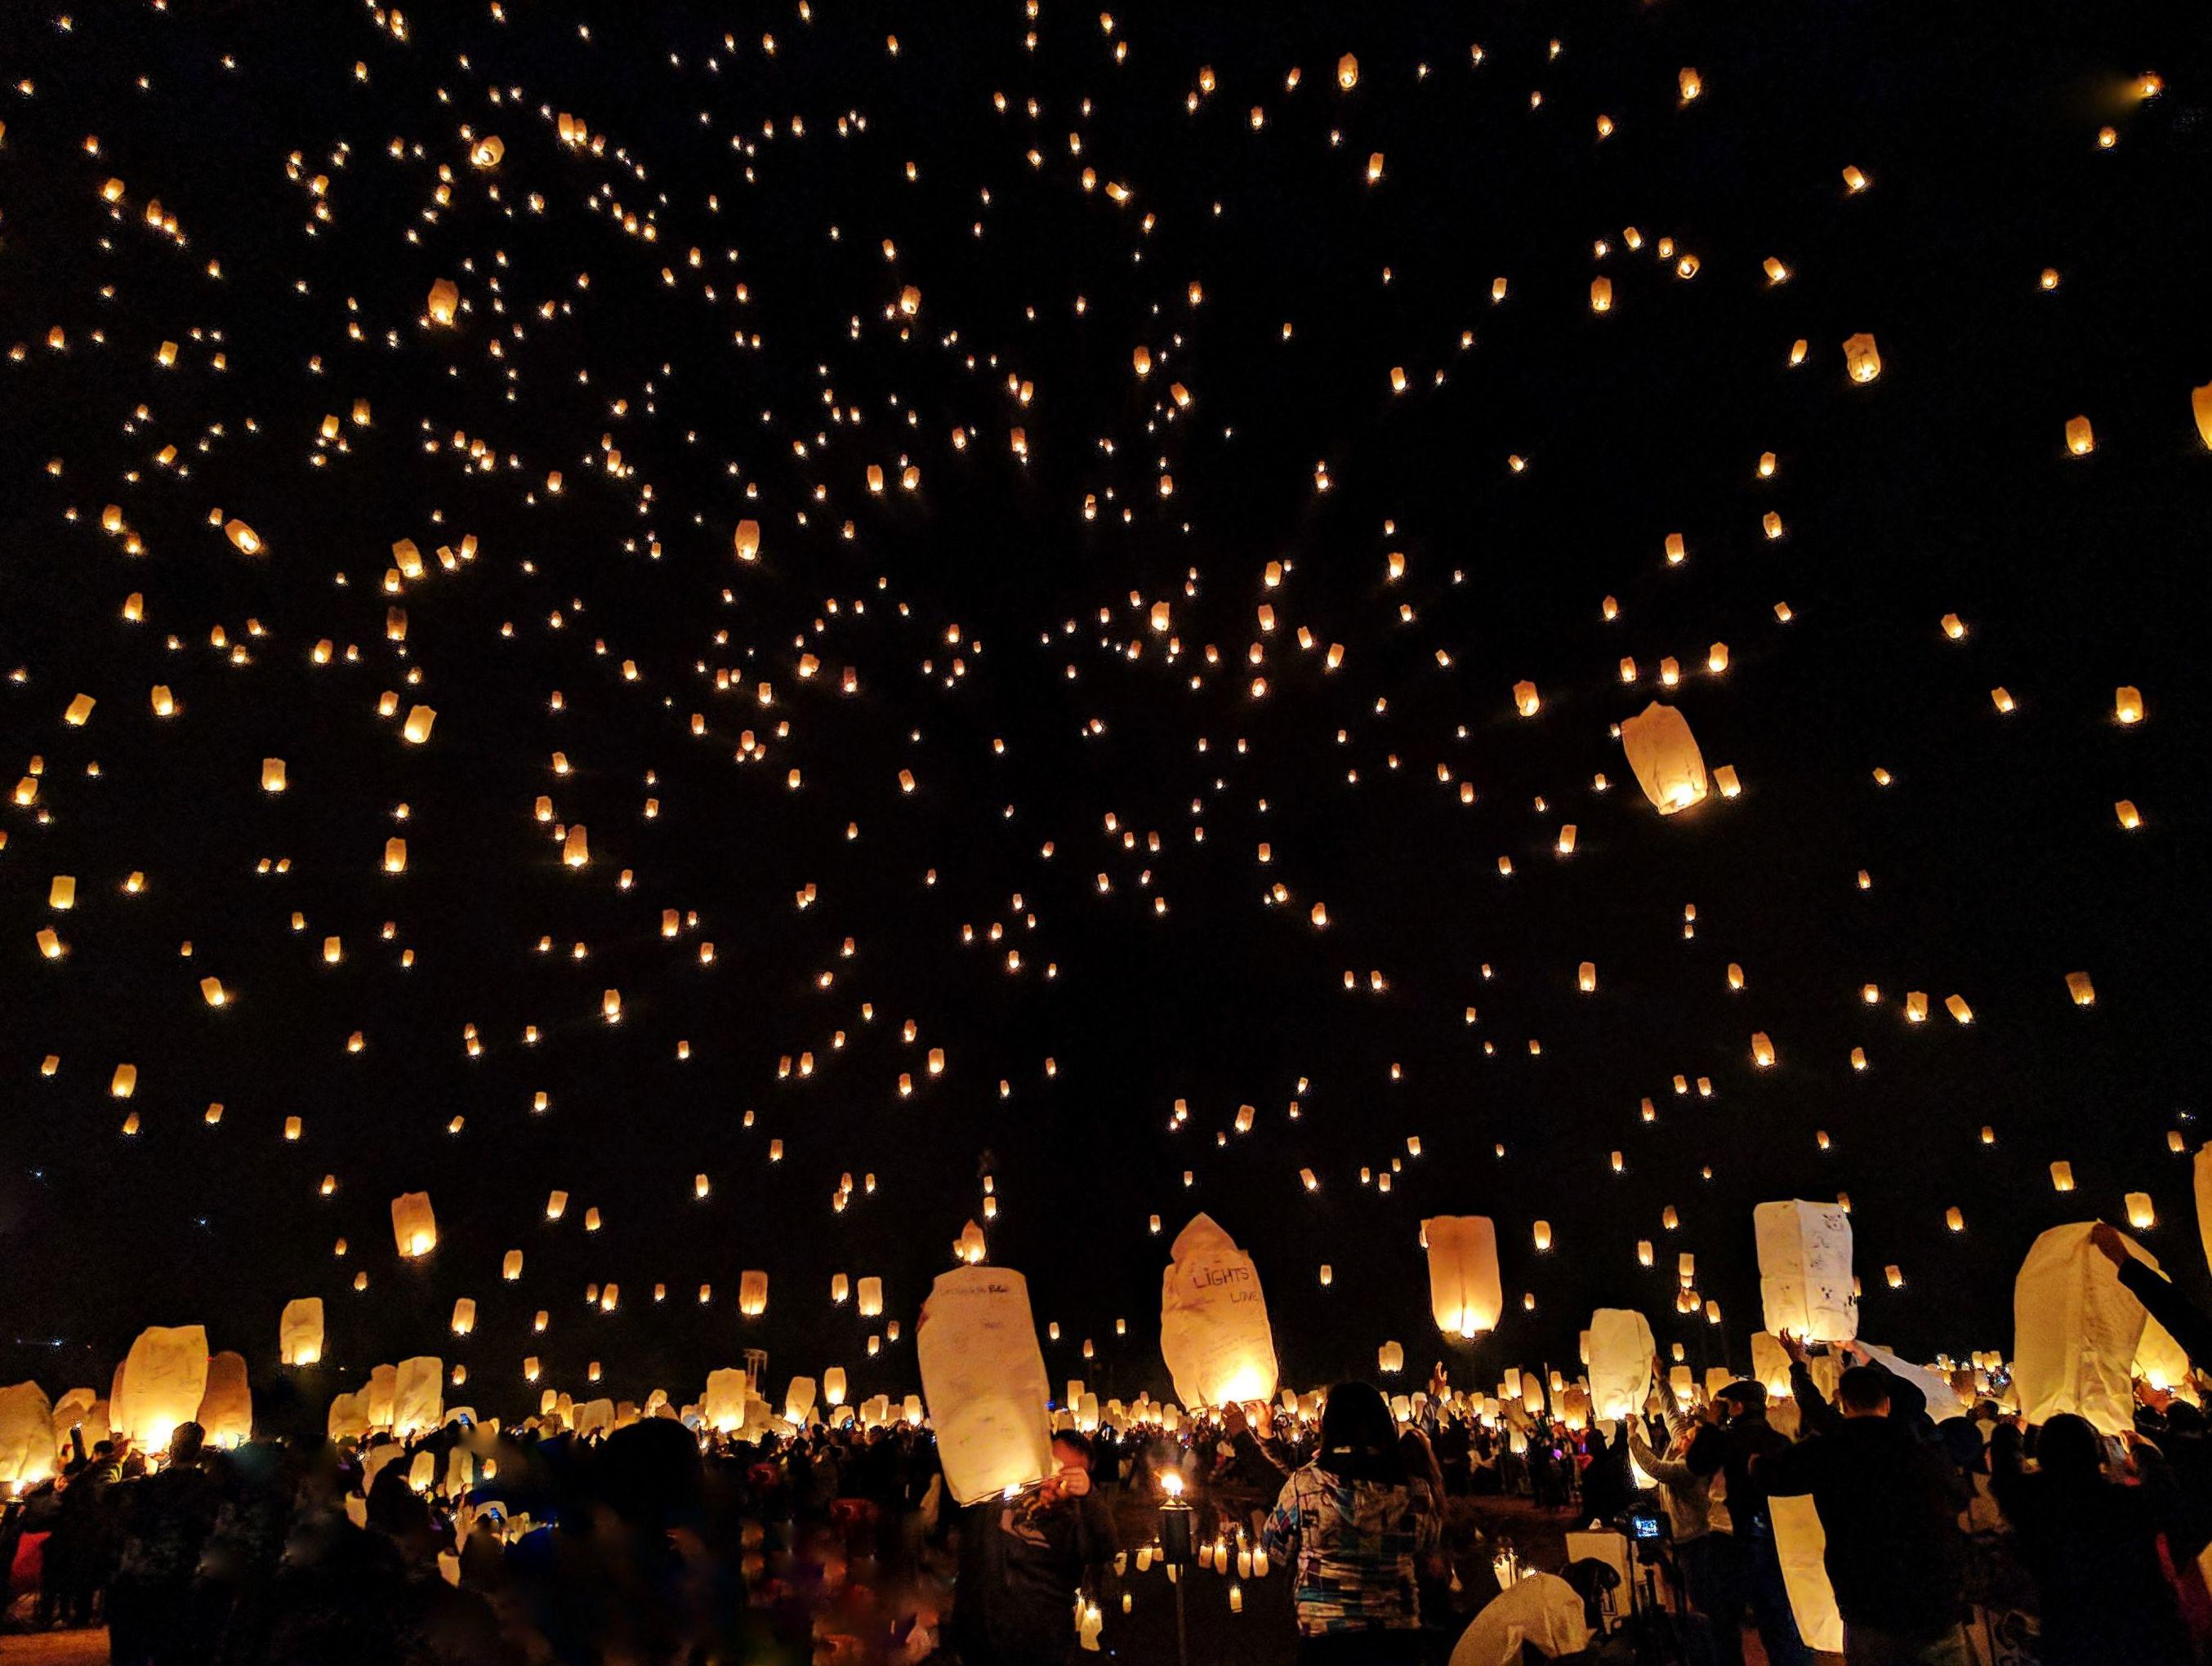 El festival de luces en Diwali